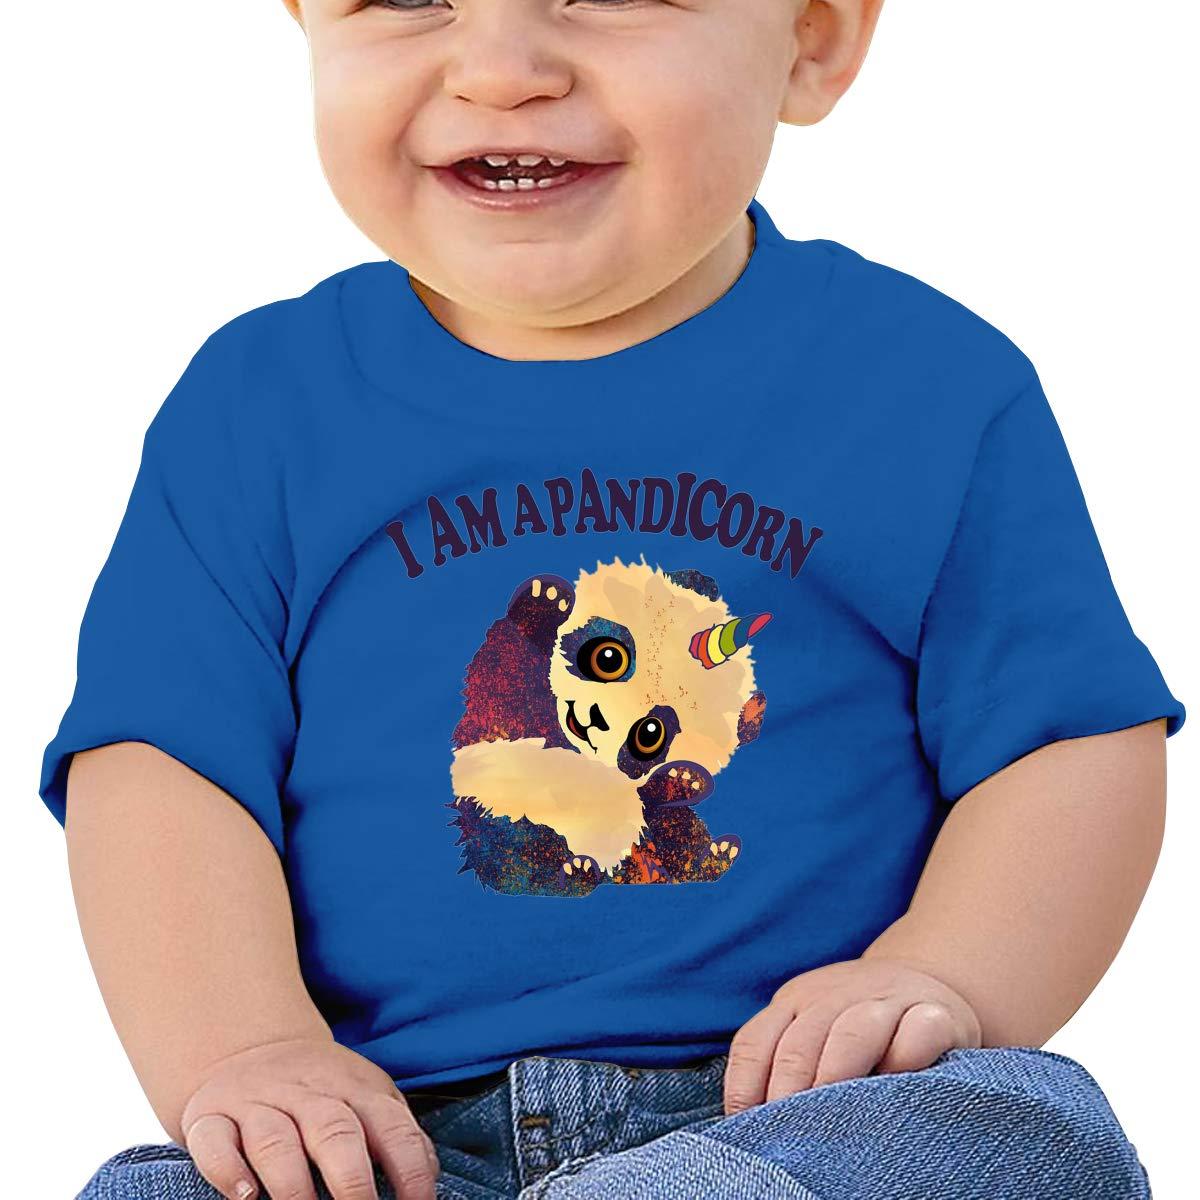 XHX403 I Am A Pandicorn Infant Kids T Shirt Cotton Tee Toddler Baby 6-18M